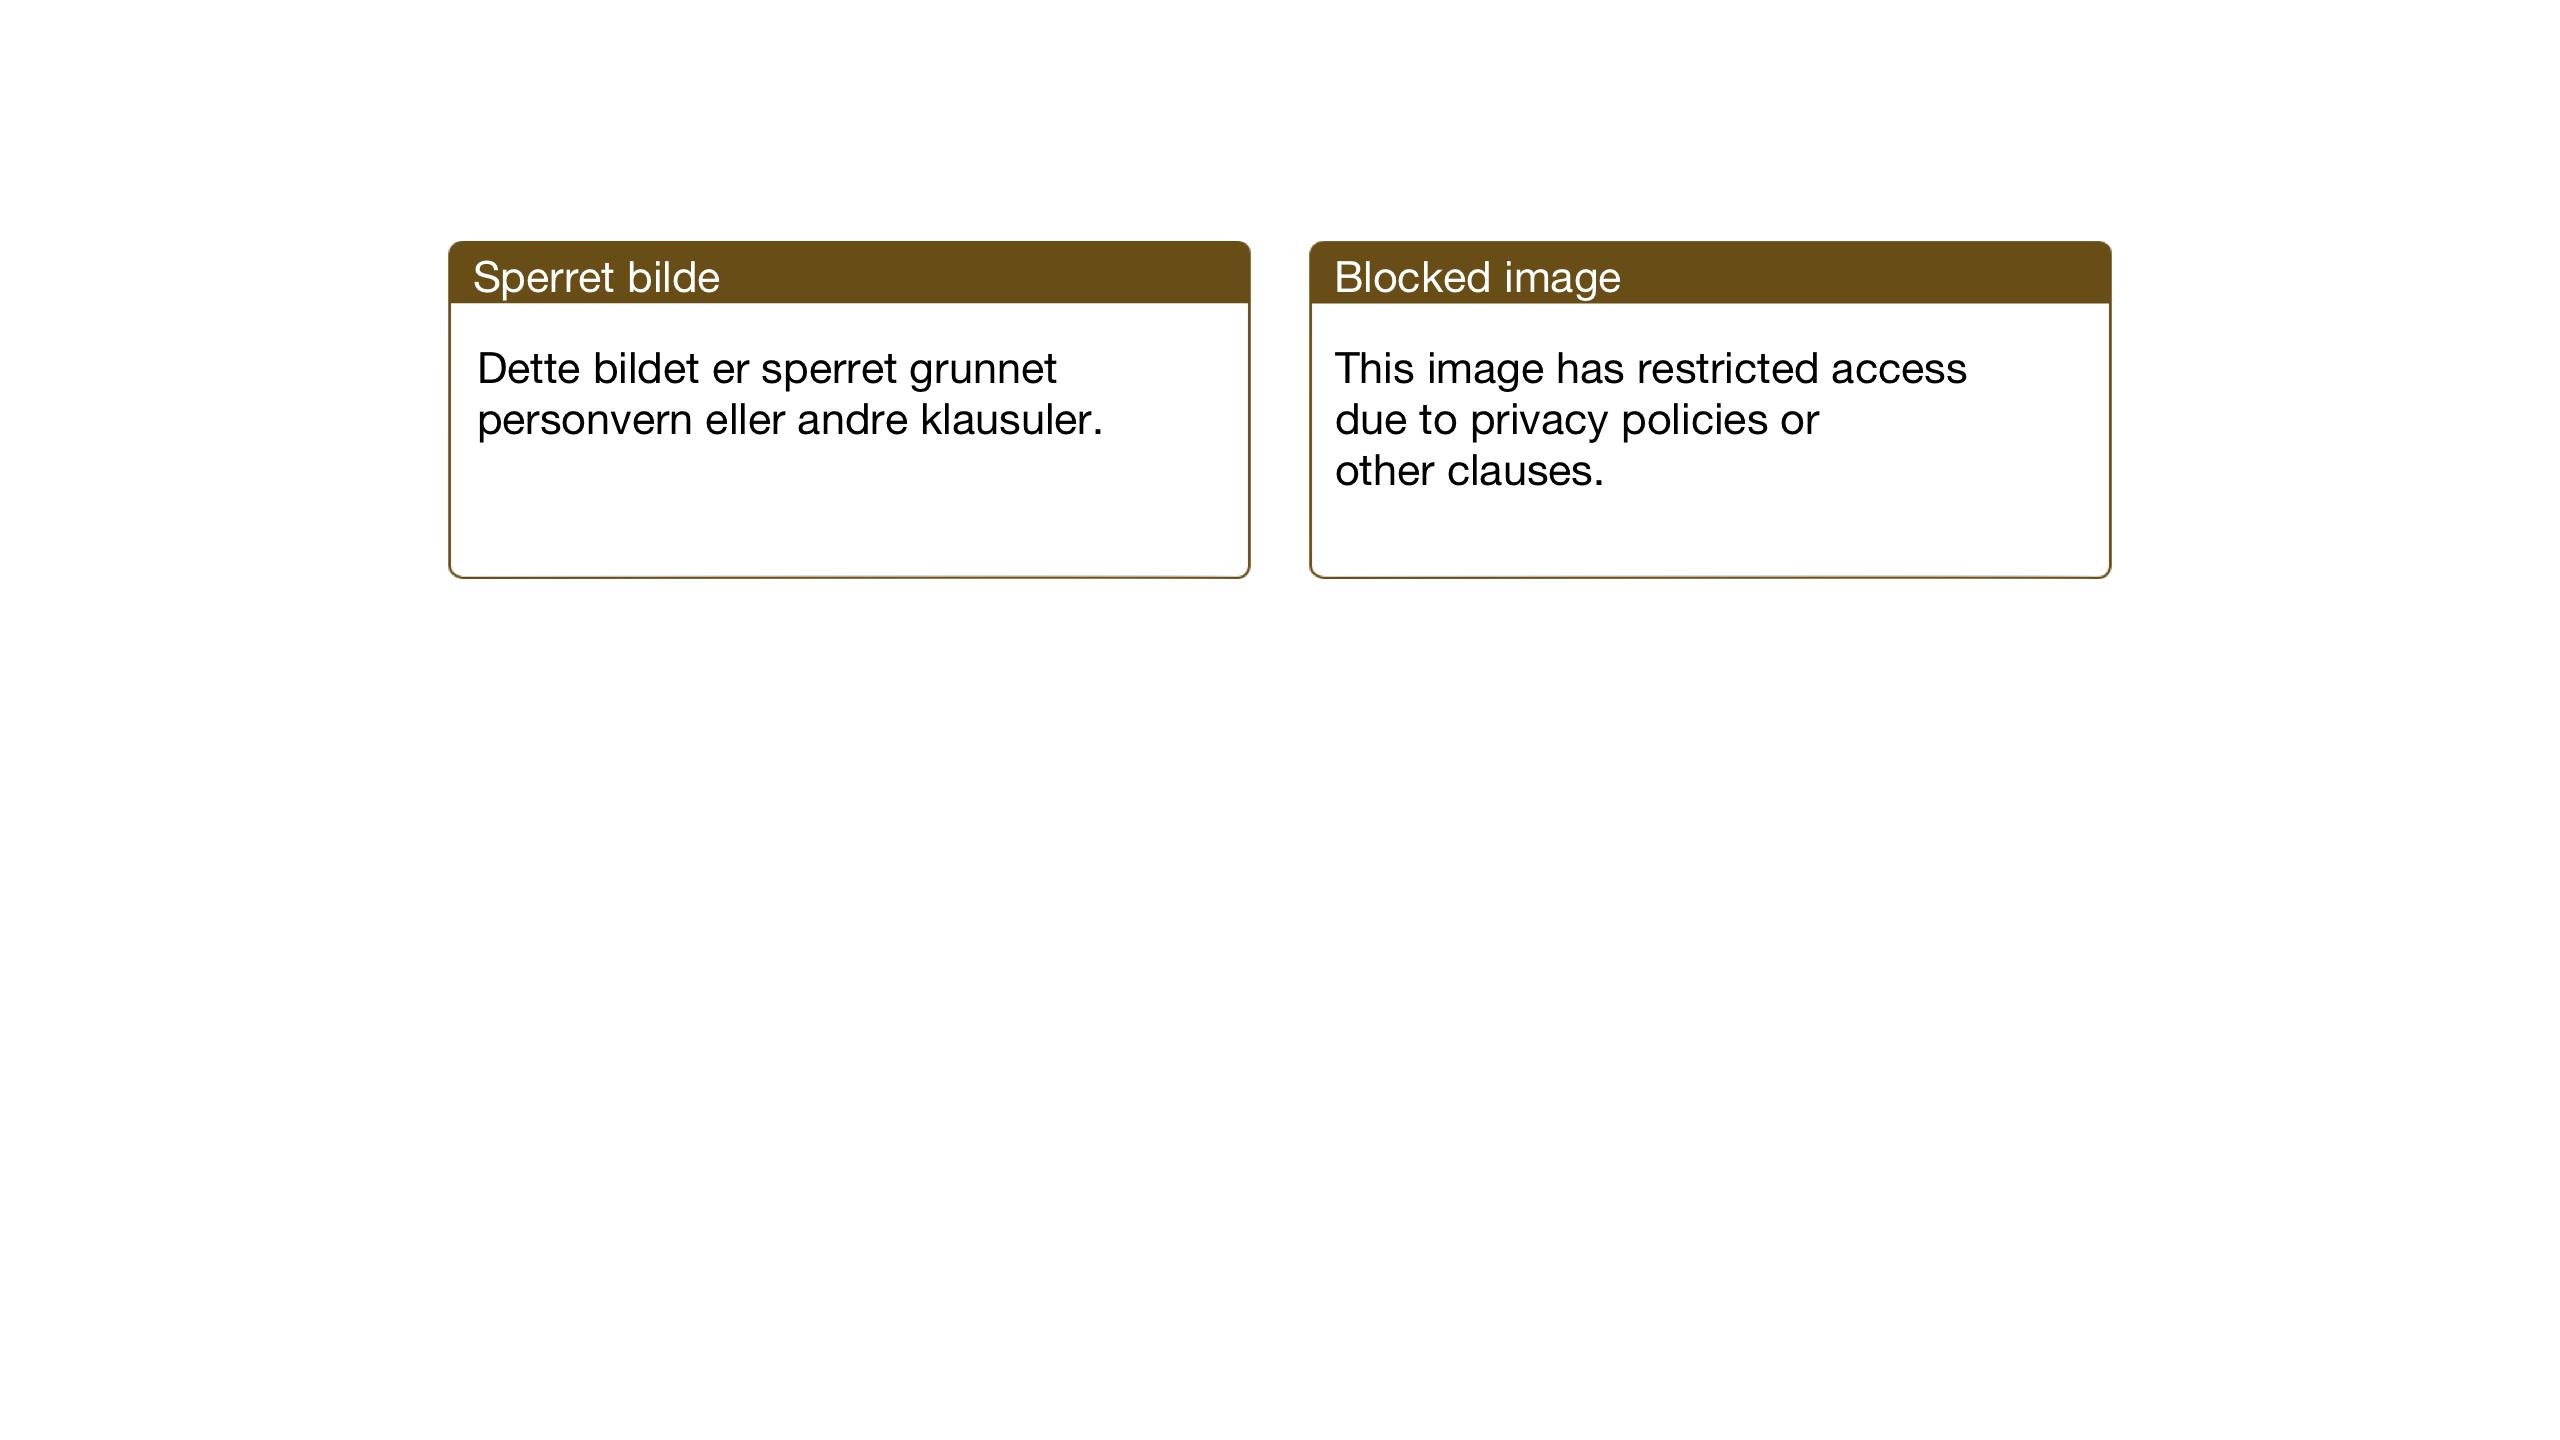 SAT, Ministerialprotokoller, klokkerbøker og fødselsregistre - Nordland, 843/L0640: Klokkerbok nr. 843C09, 1925-1941, s. 182